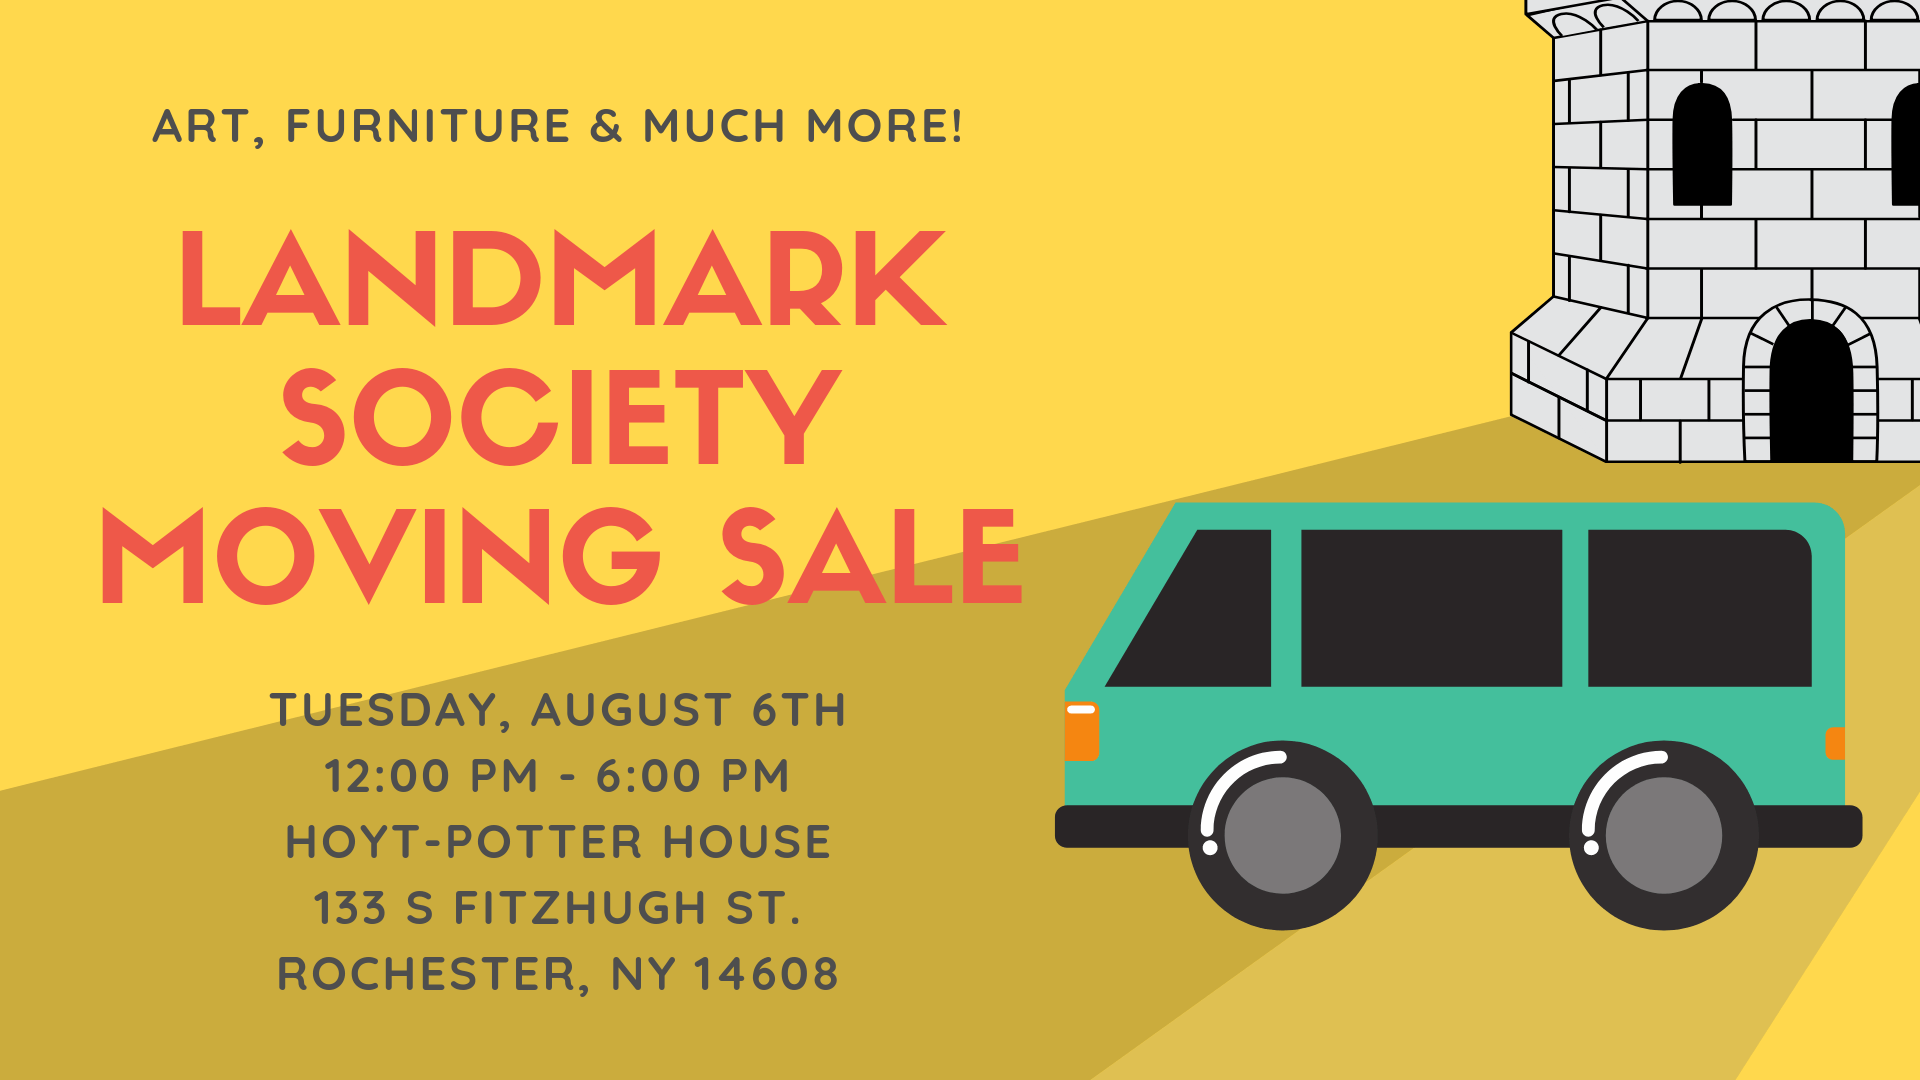 Landmark Society Moving Sale! 1